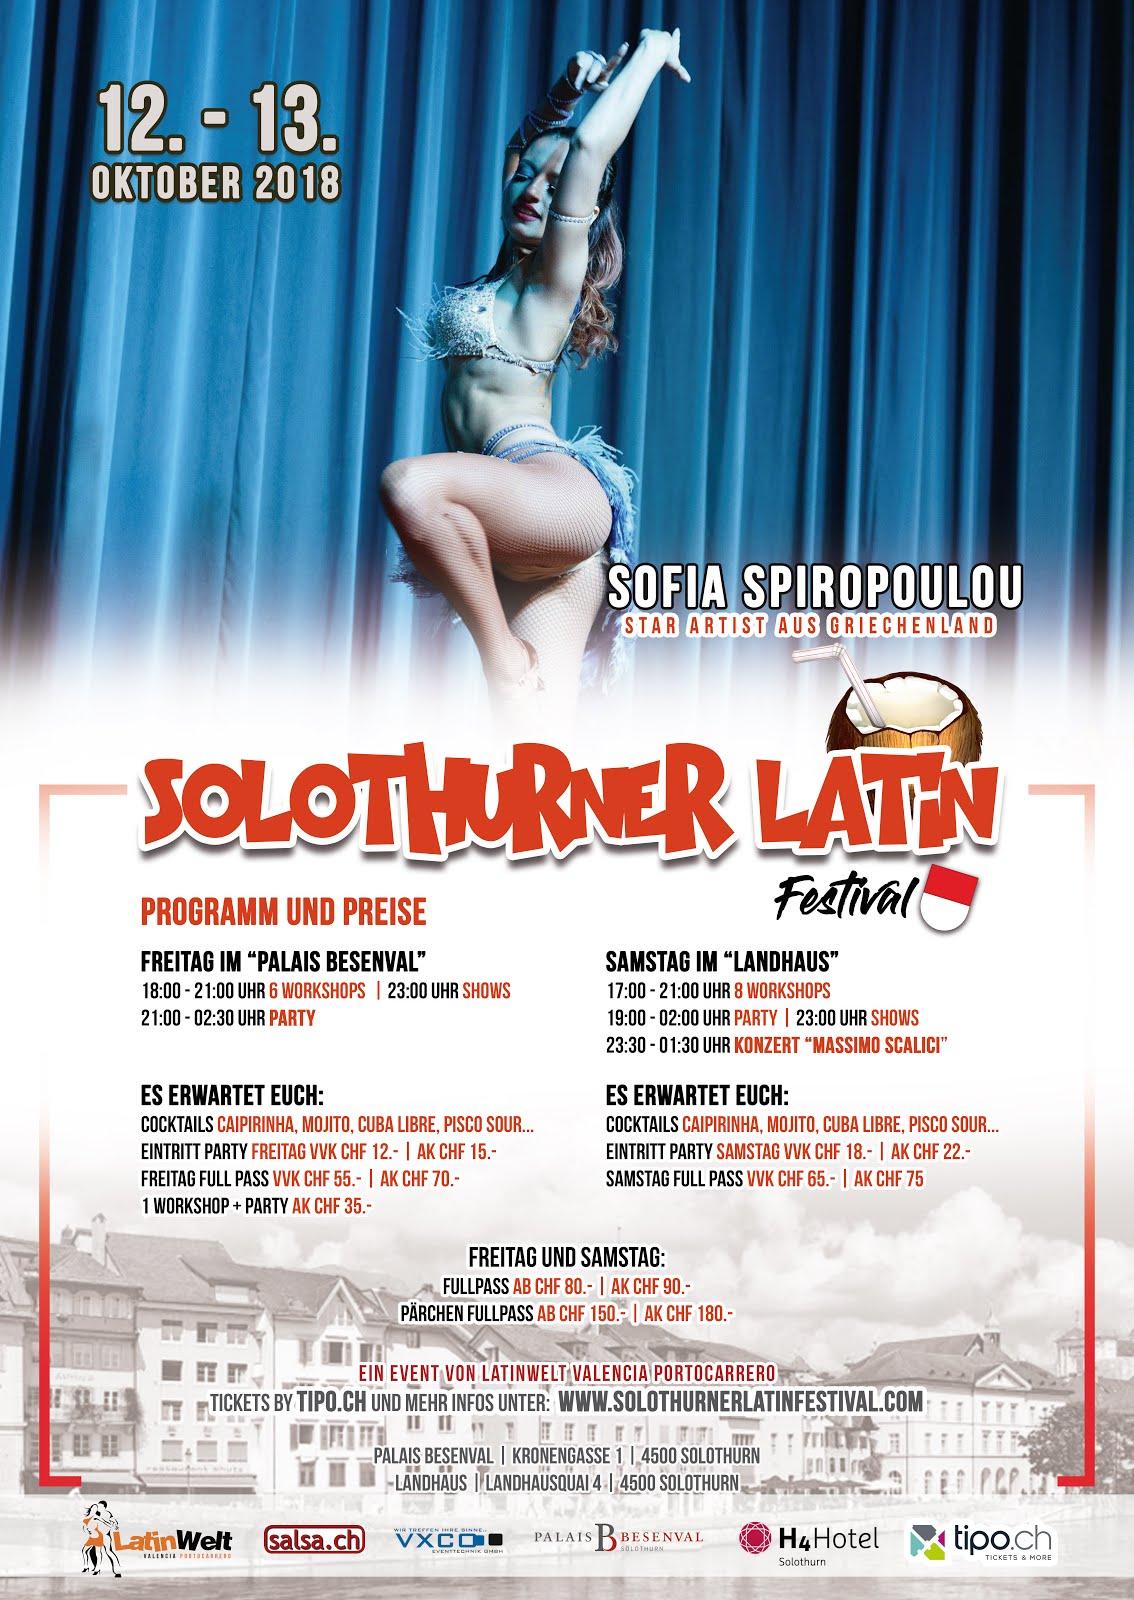 SOLOTHURNER LATIN FESTIVAL